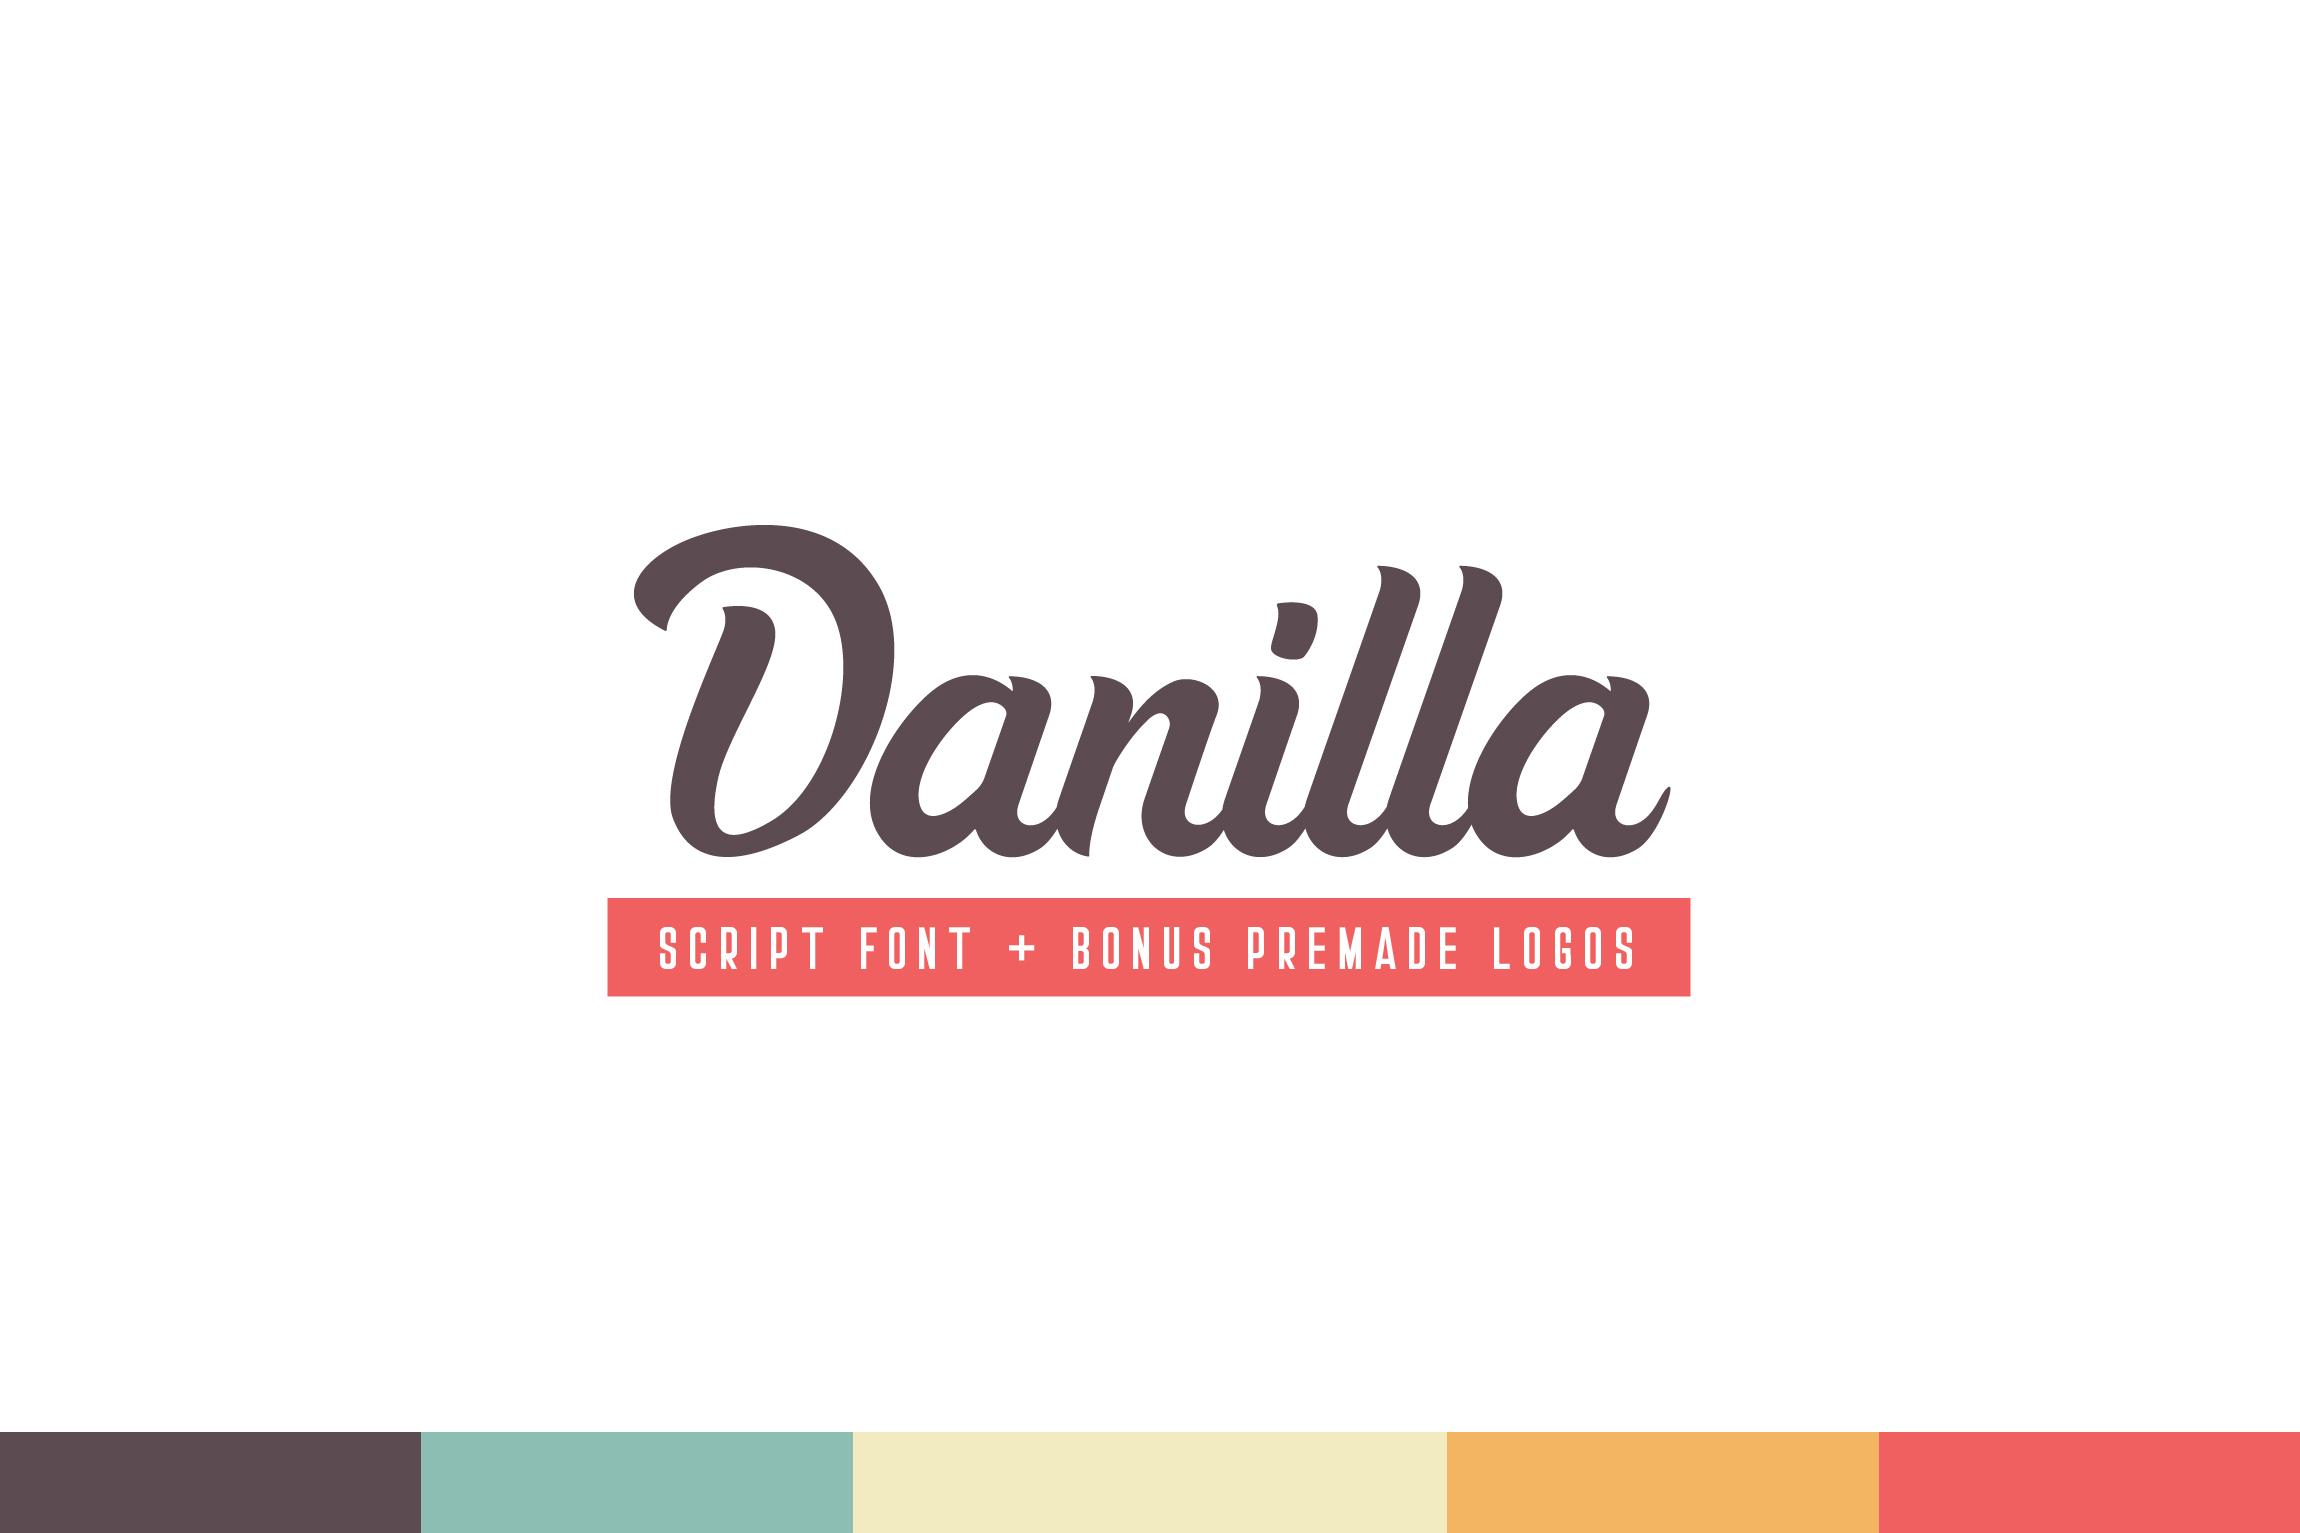 Danilla Font + Premade Logos example image 6